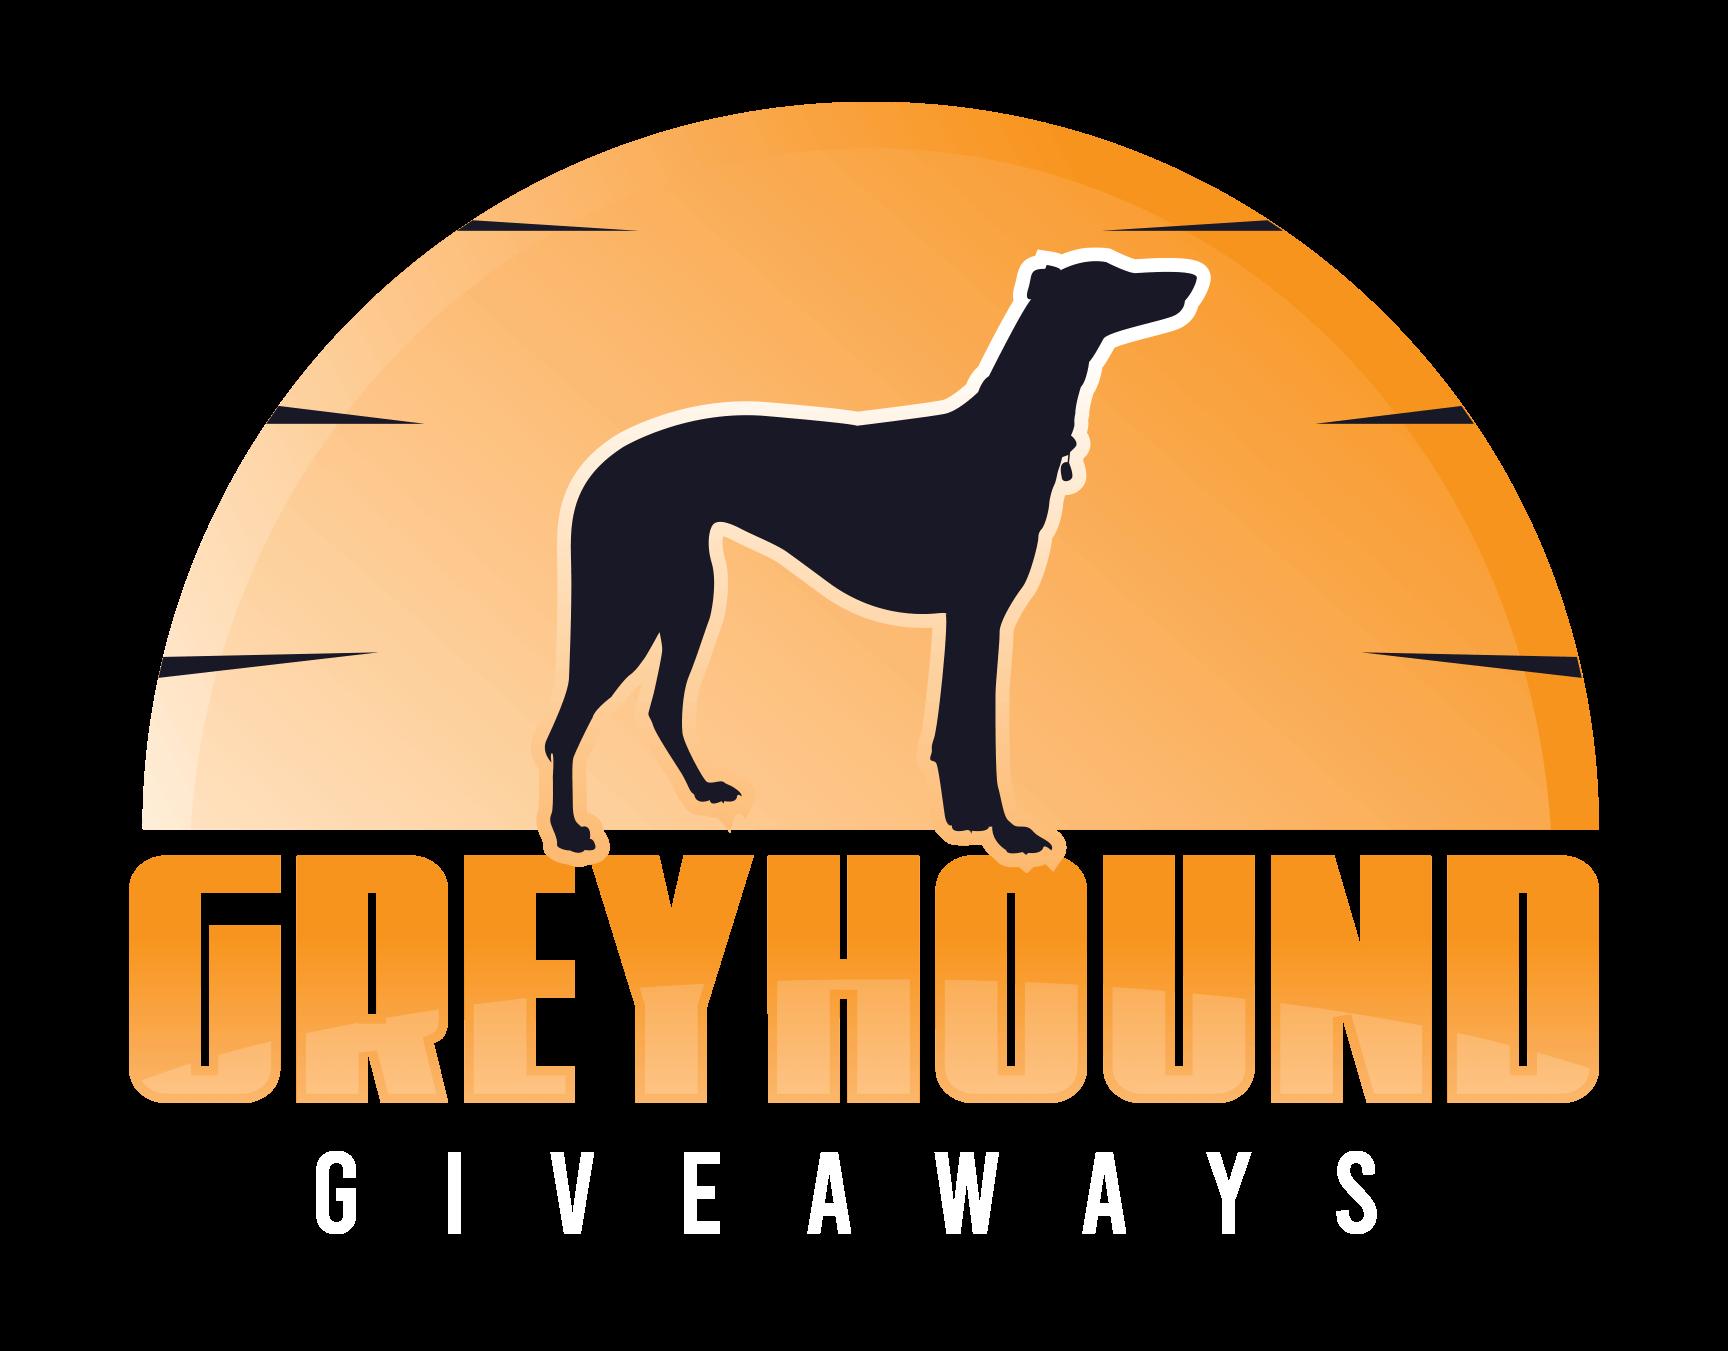 Greyhound-Giveaways-Logo